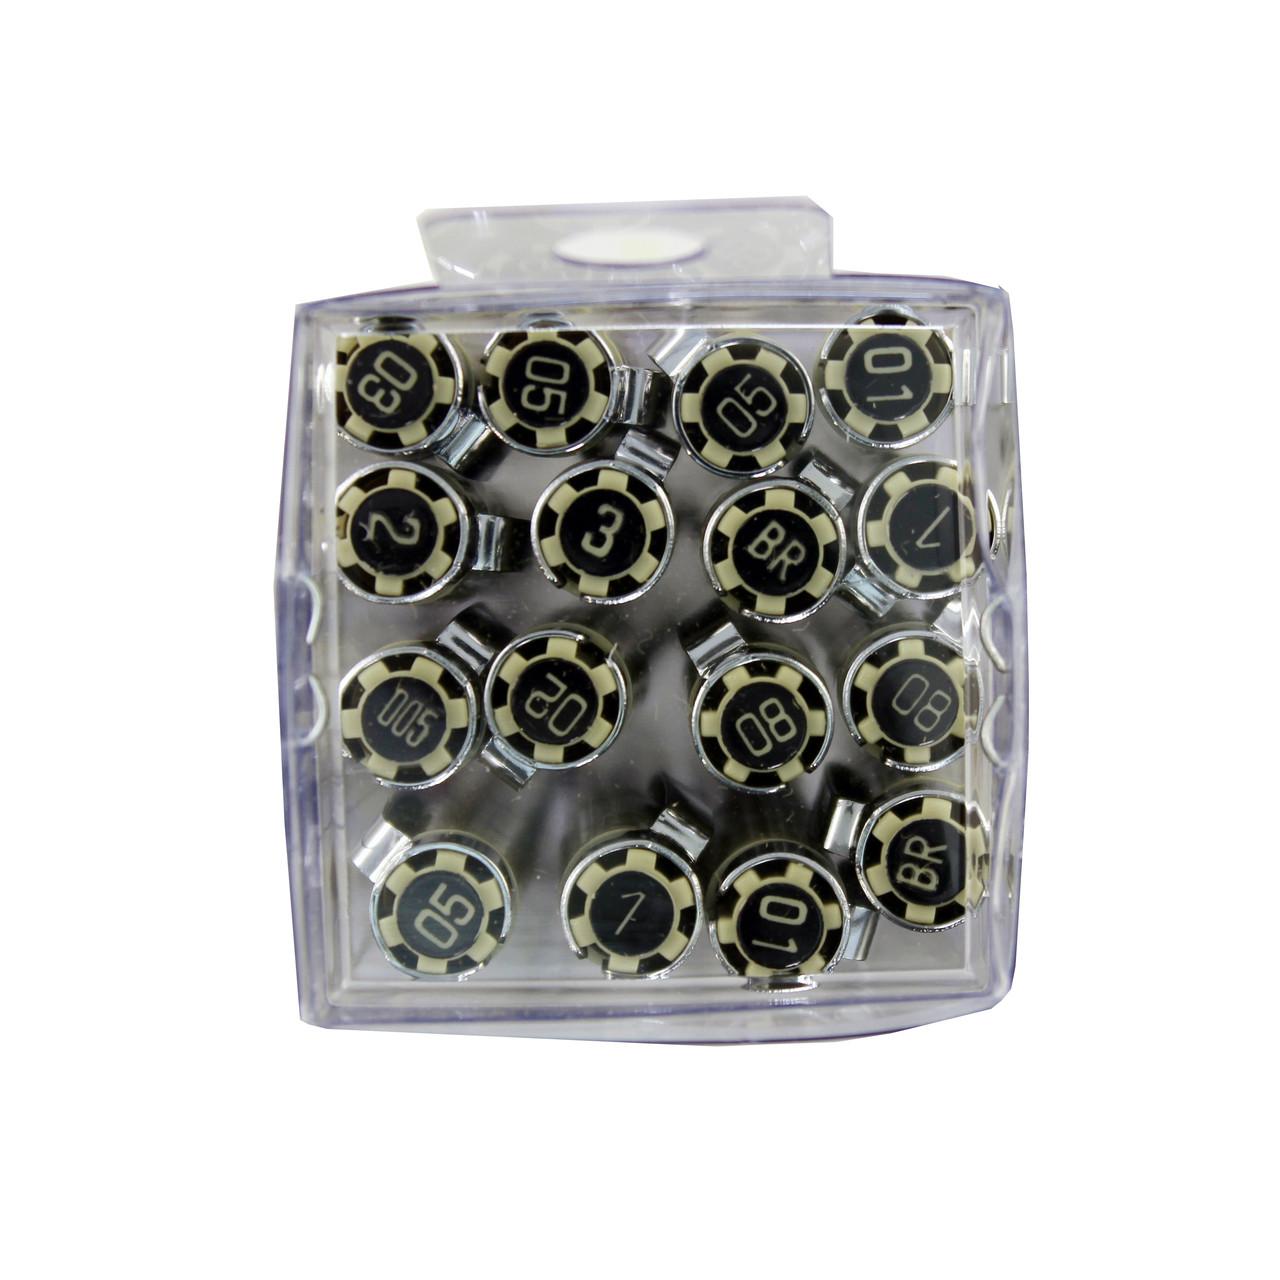 Pigma Micron 16-pen Cube Set All Black